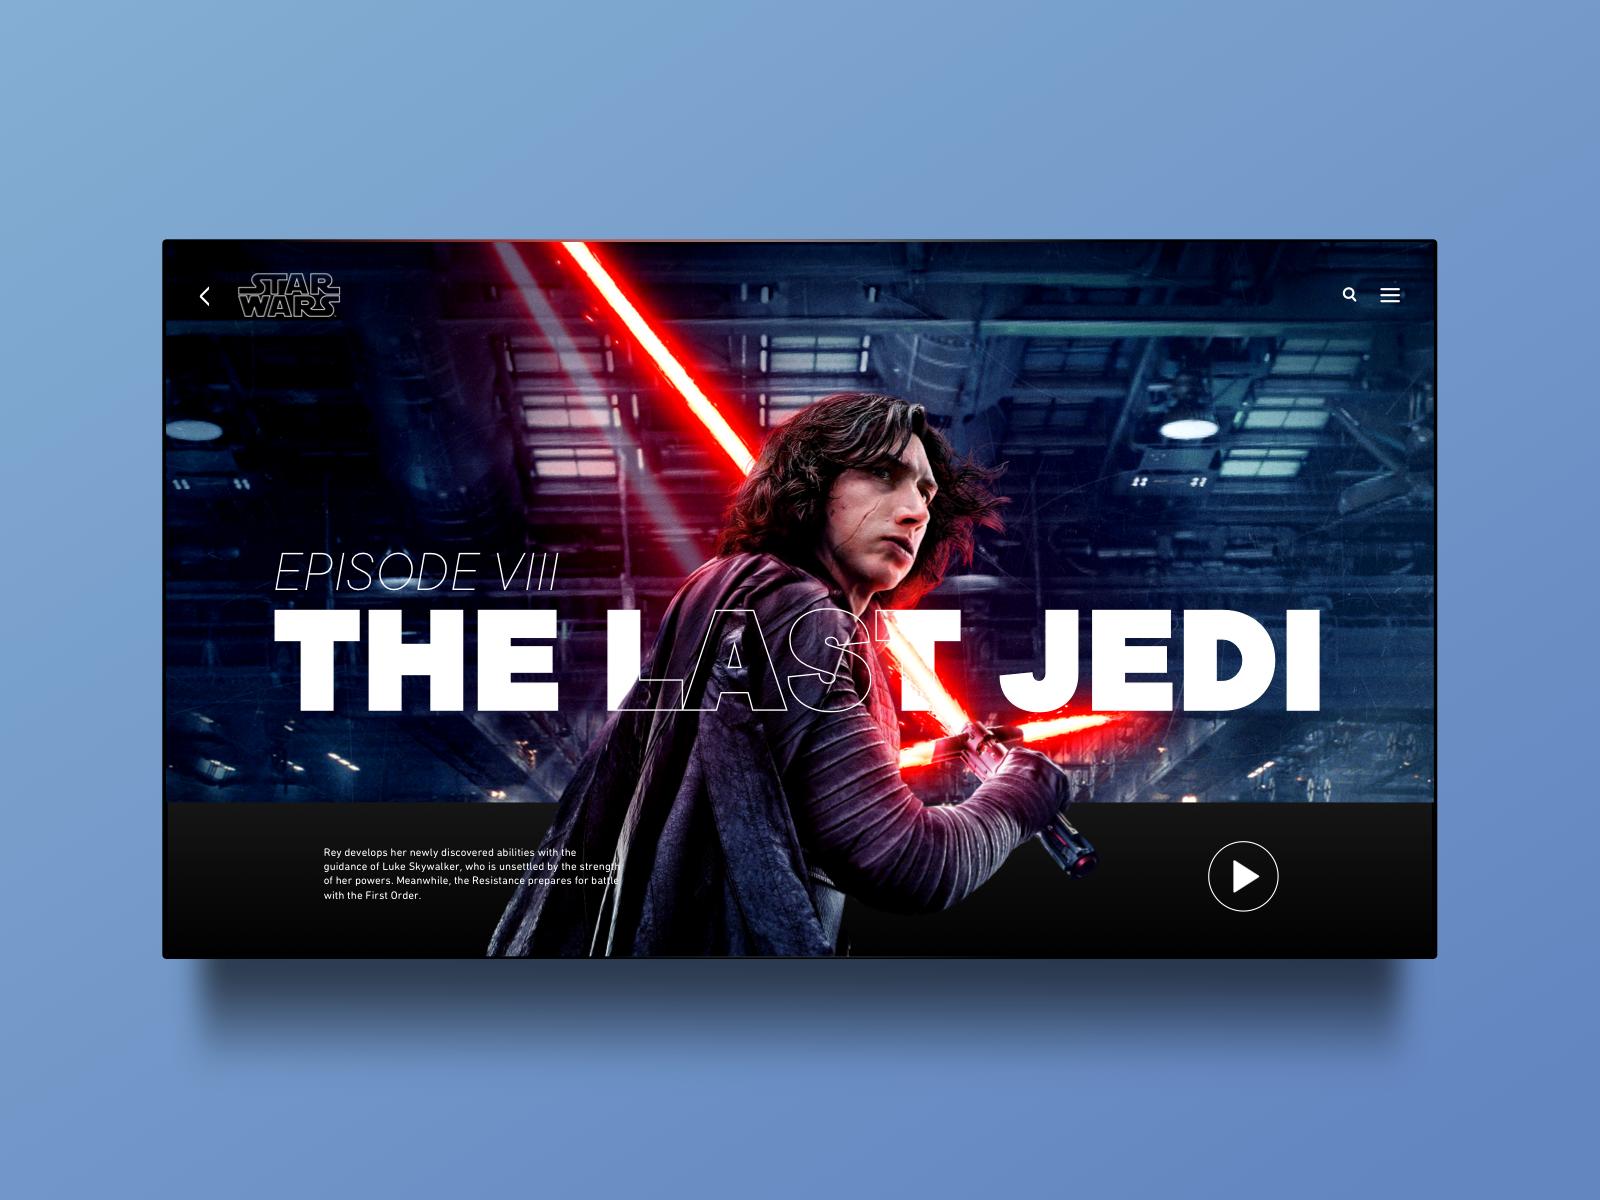 The Last Jedi Web Design By Vincent Maufay On Dribbble